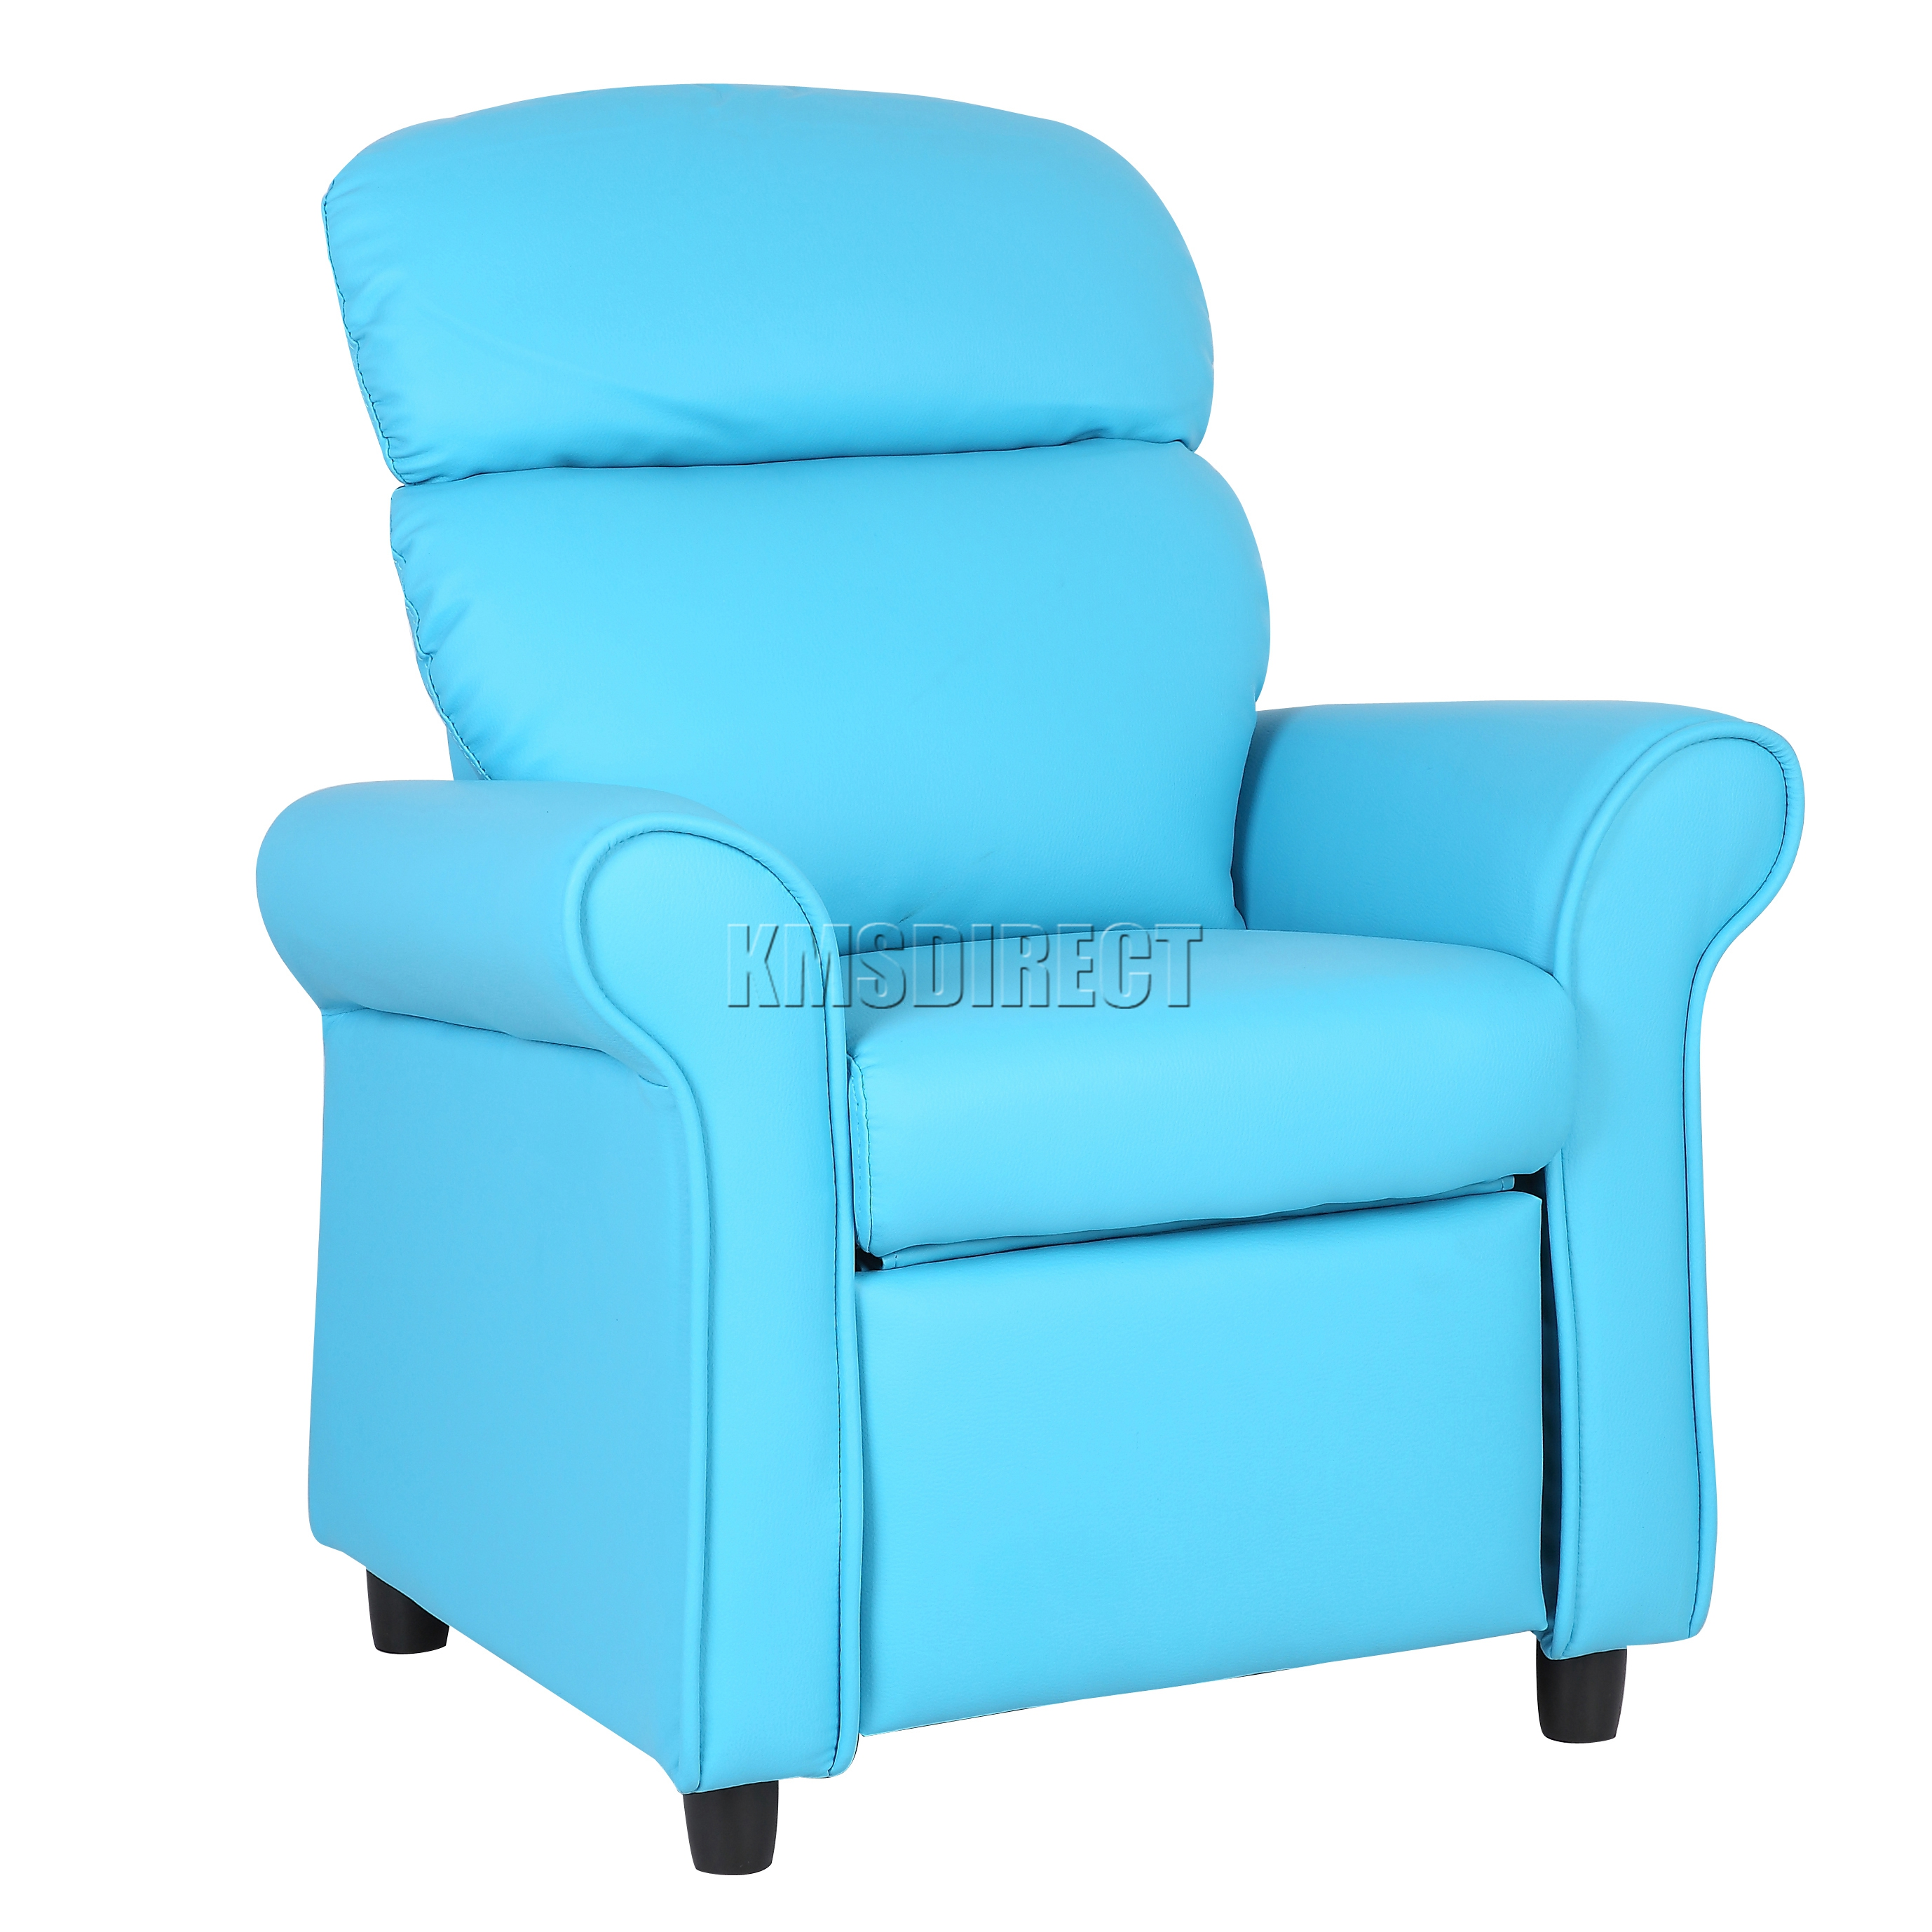 Foxhunter kids recliner armchair games chair sofa children for Kids chair leather